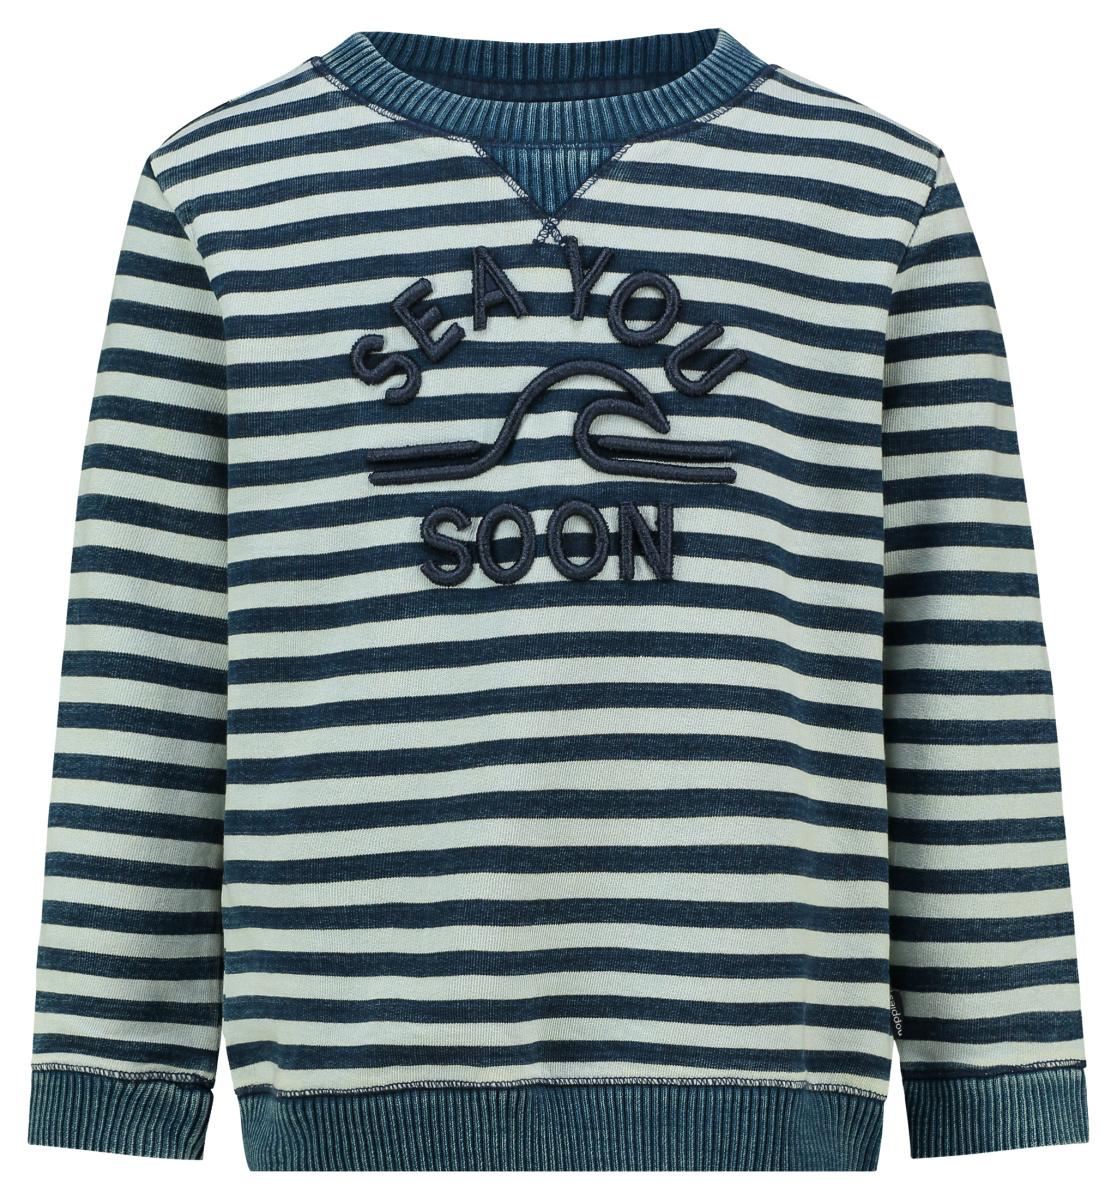 Sweater stripe-1